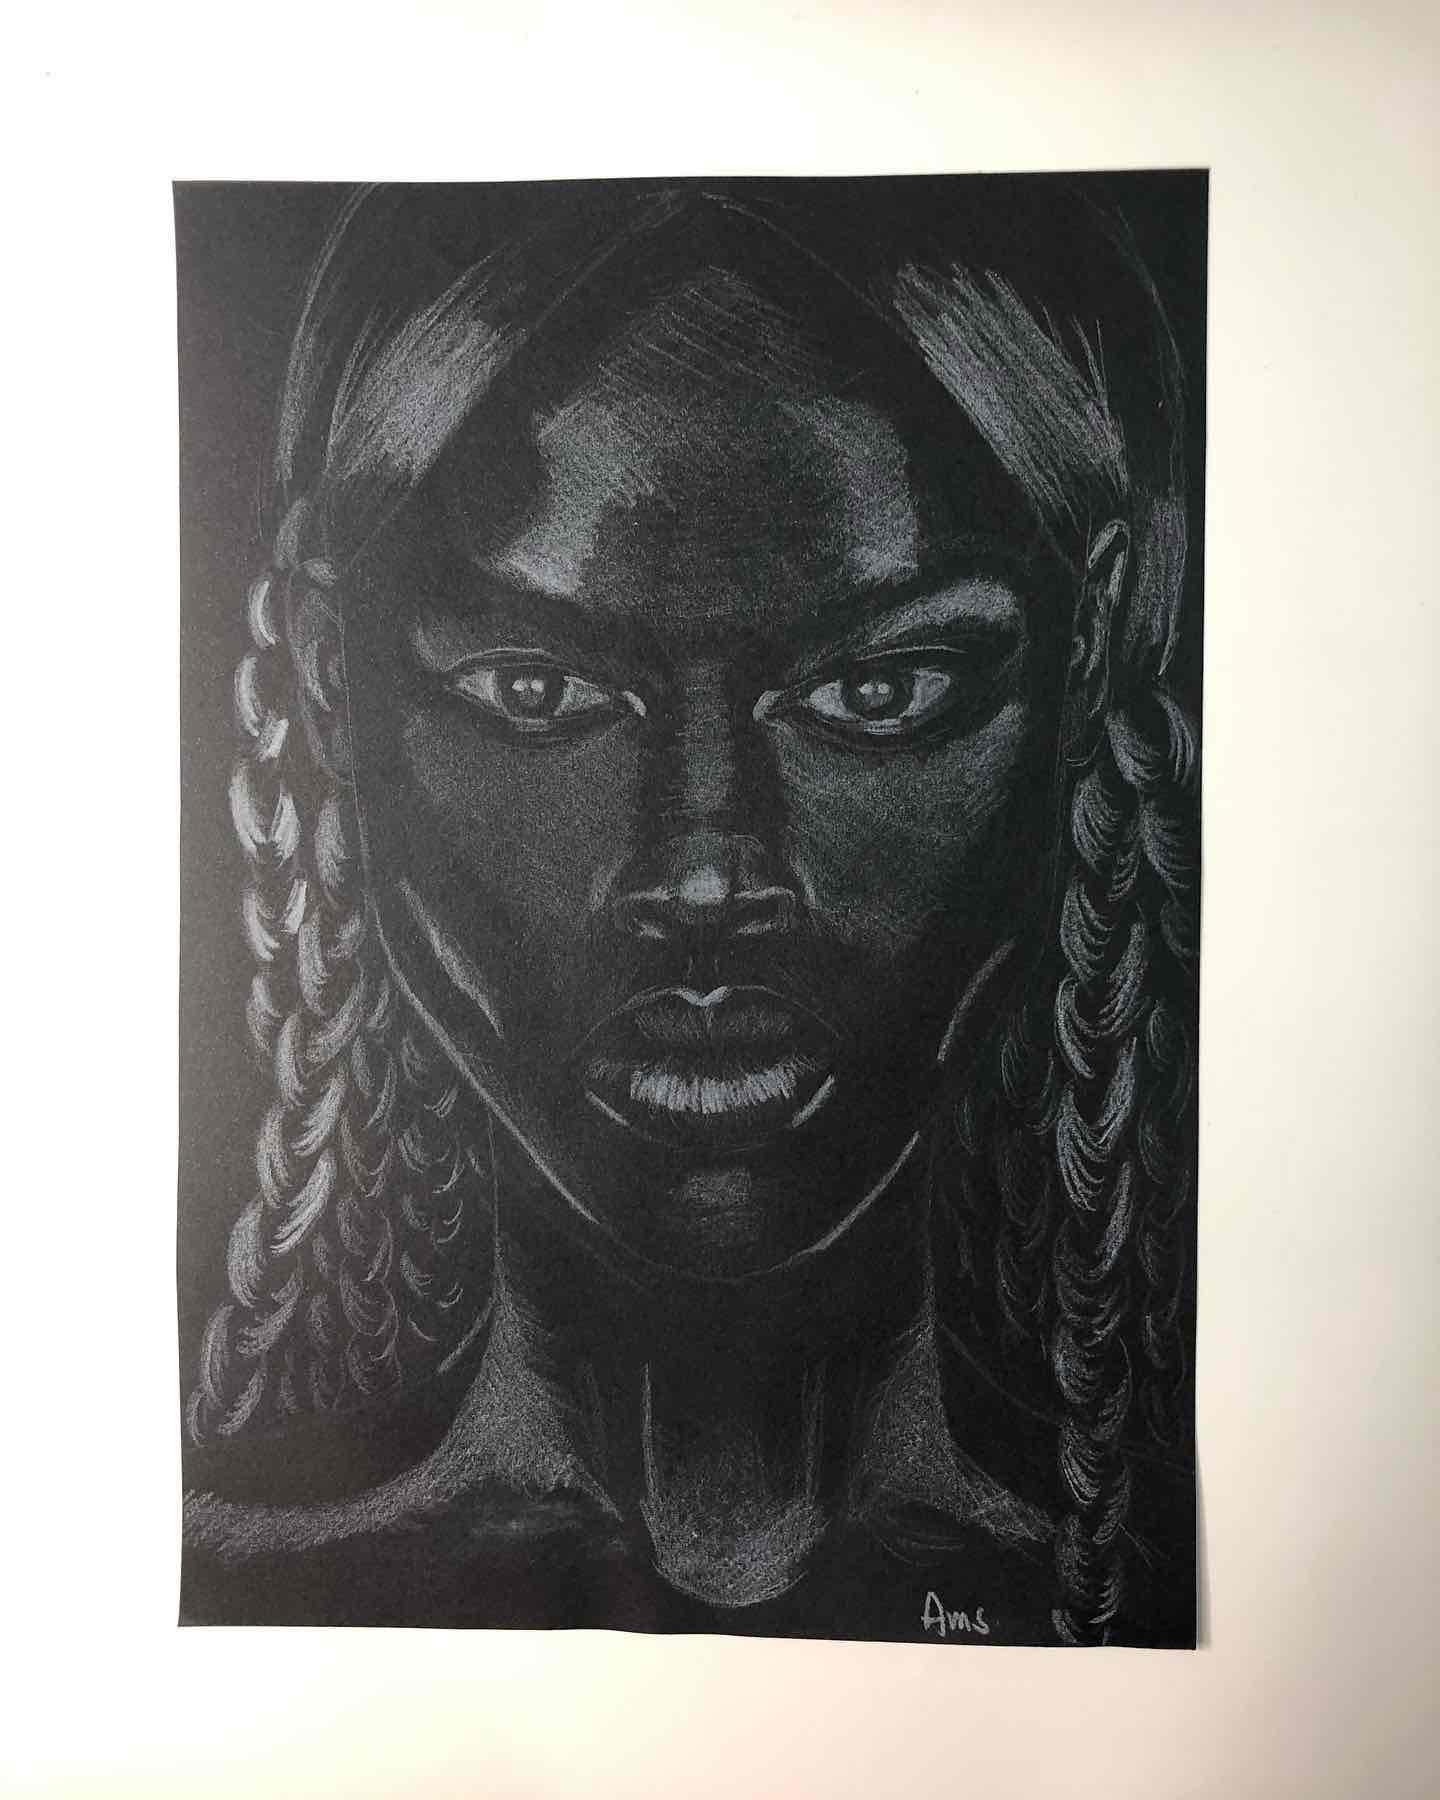 Obra: Pieza #5 de Serie Black Girls Matter